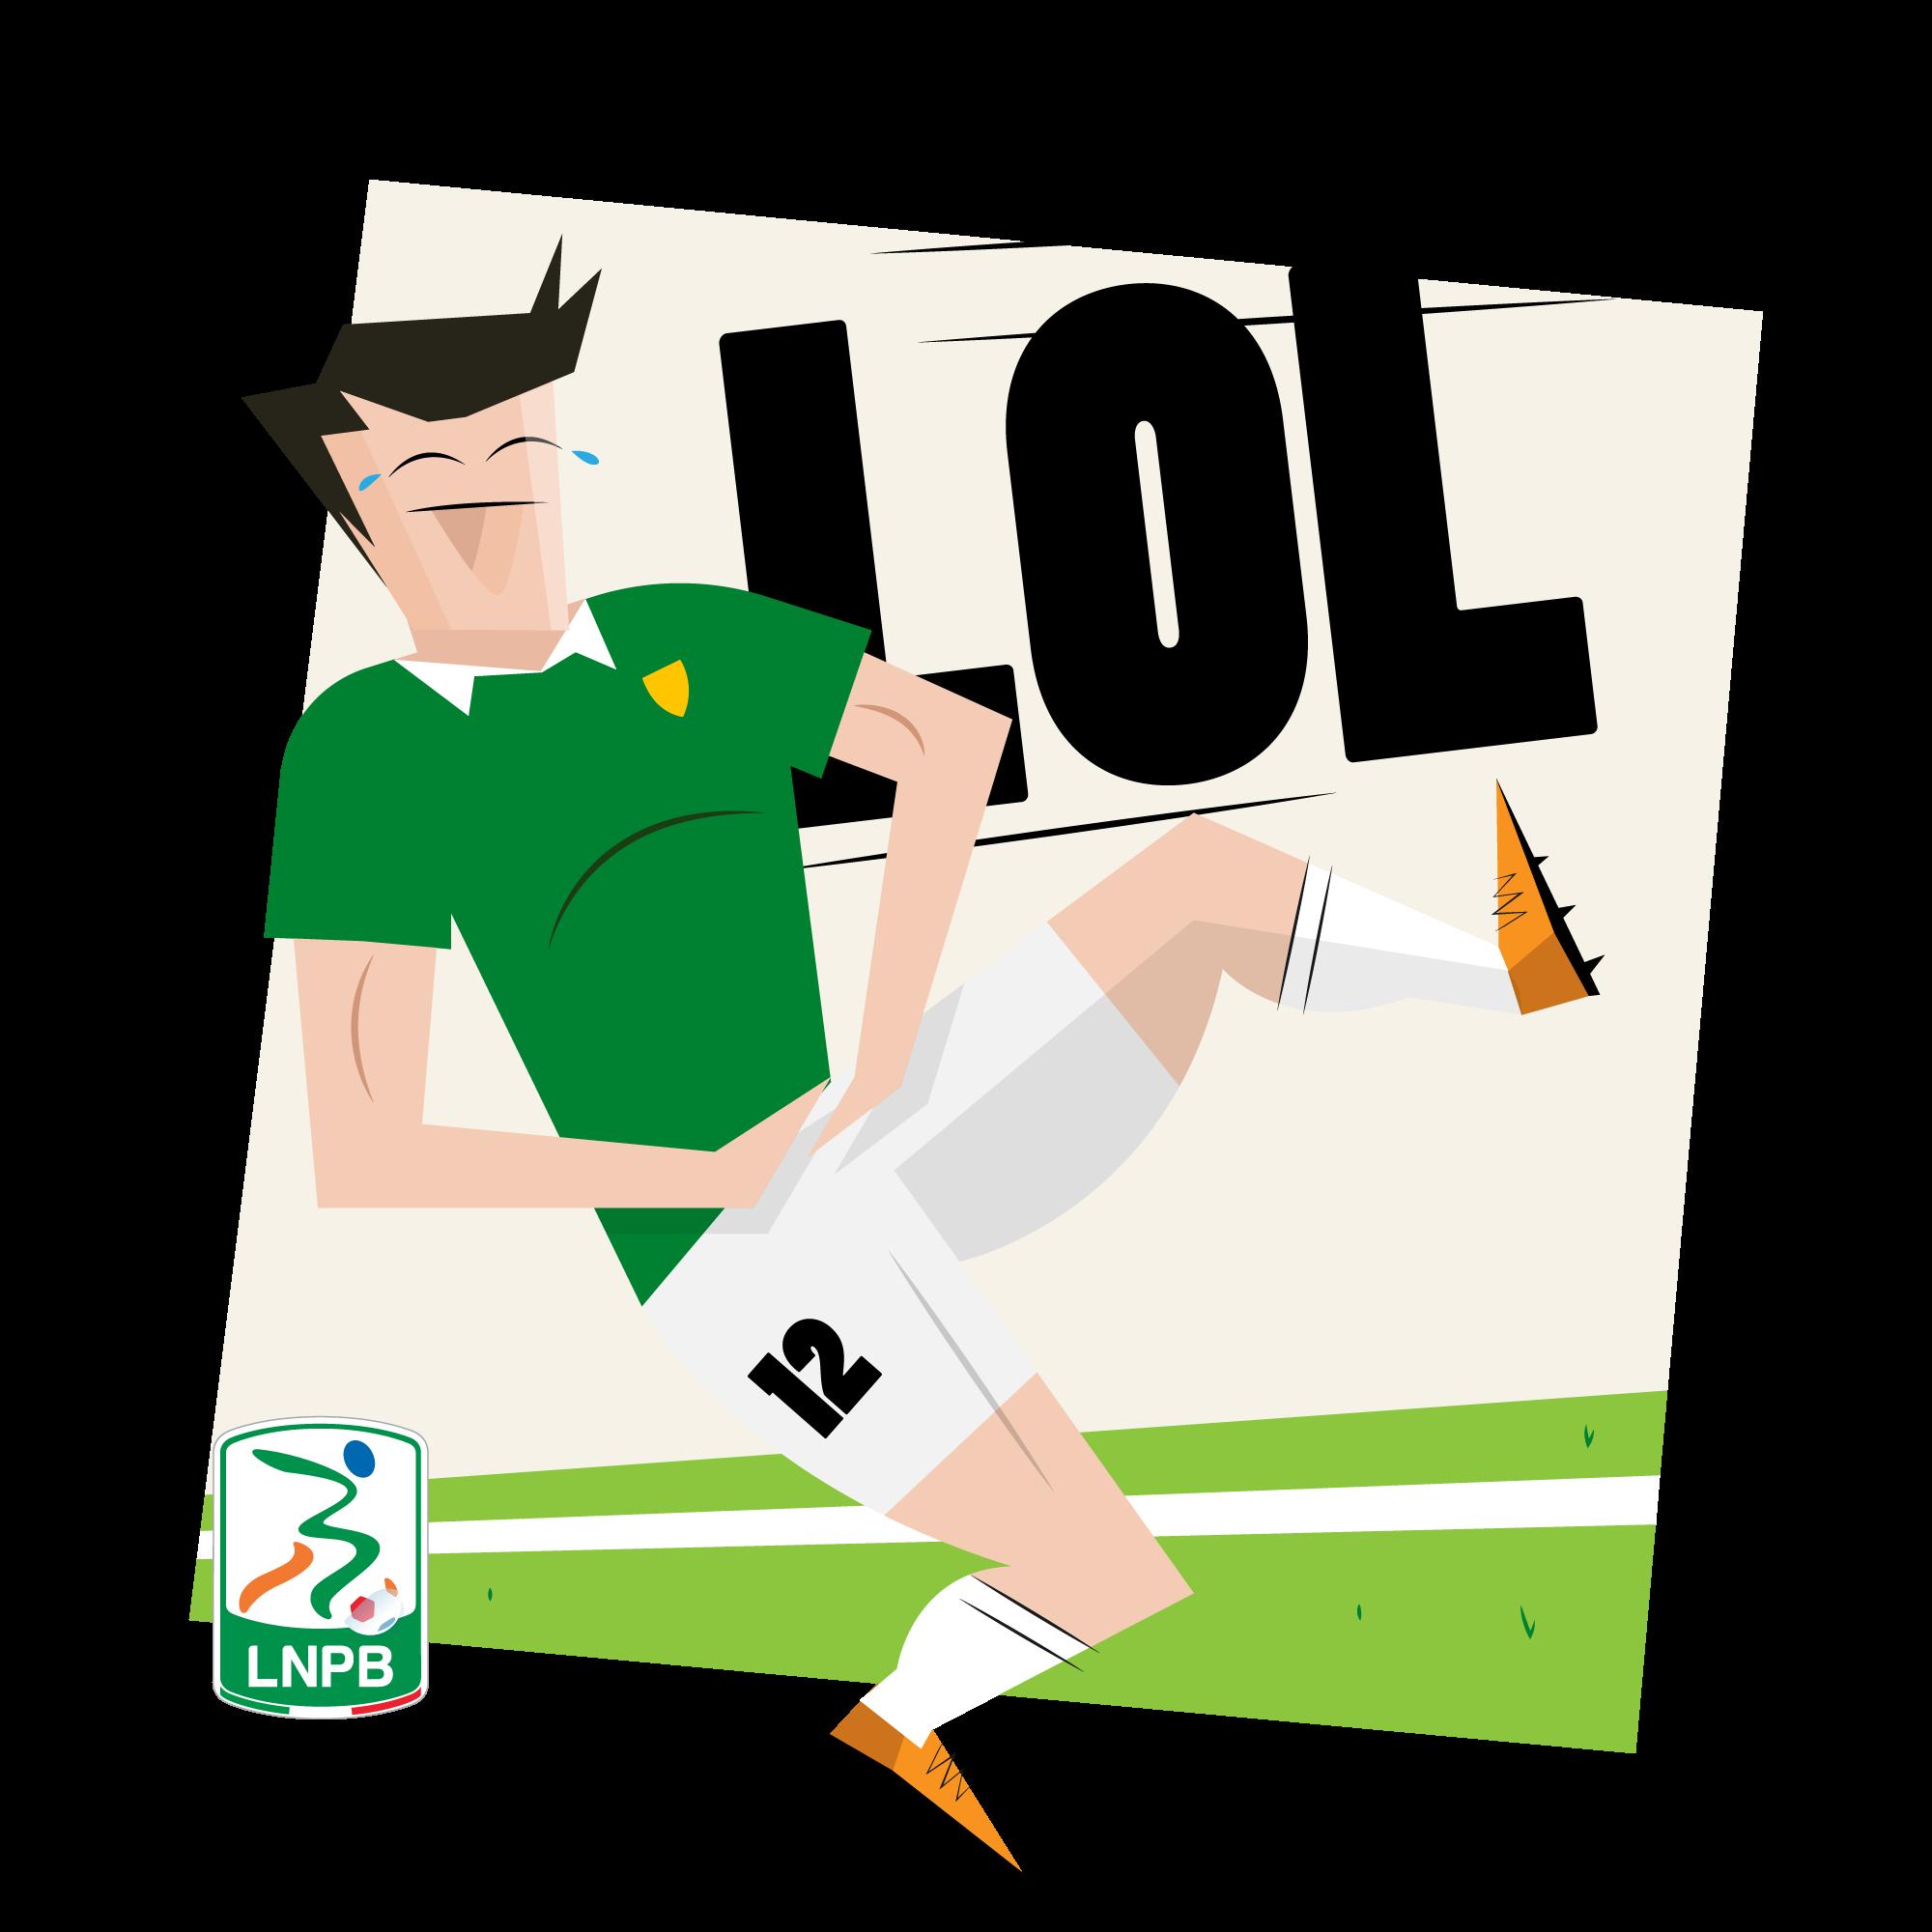 Lega B - App ufficiale messages sticker-11